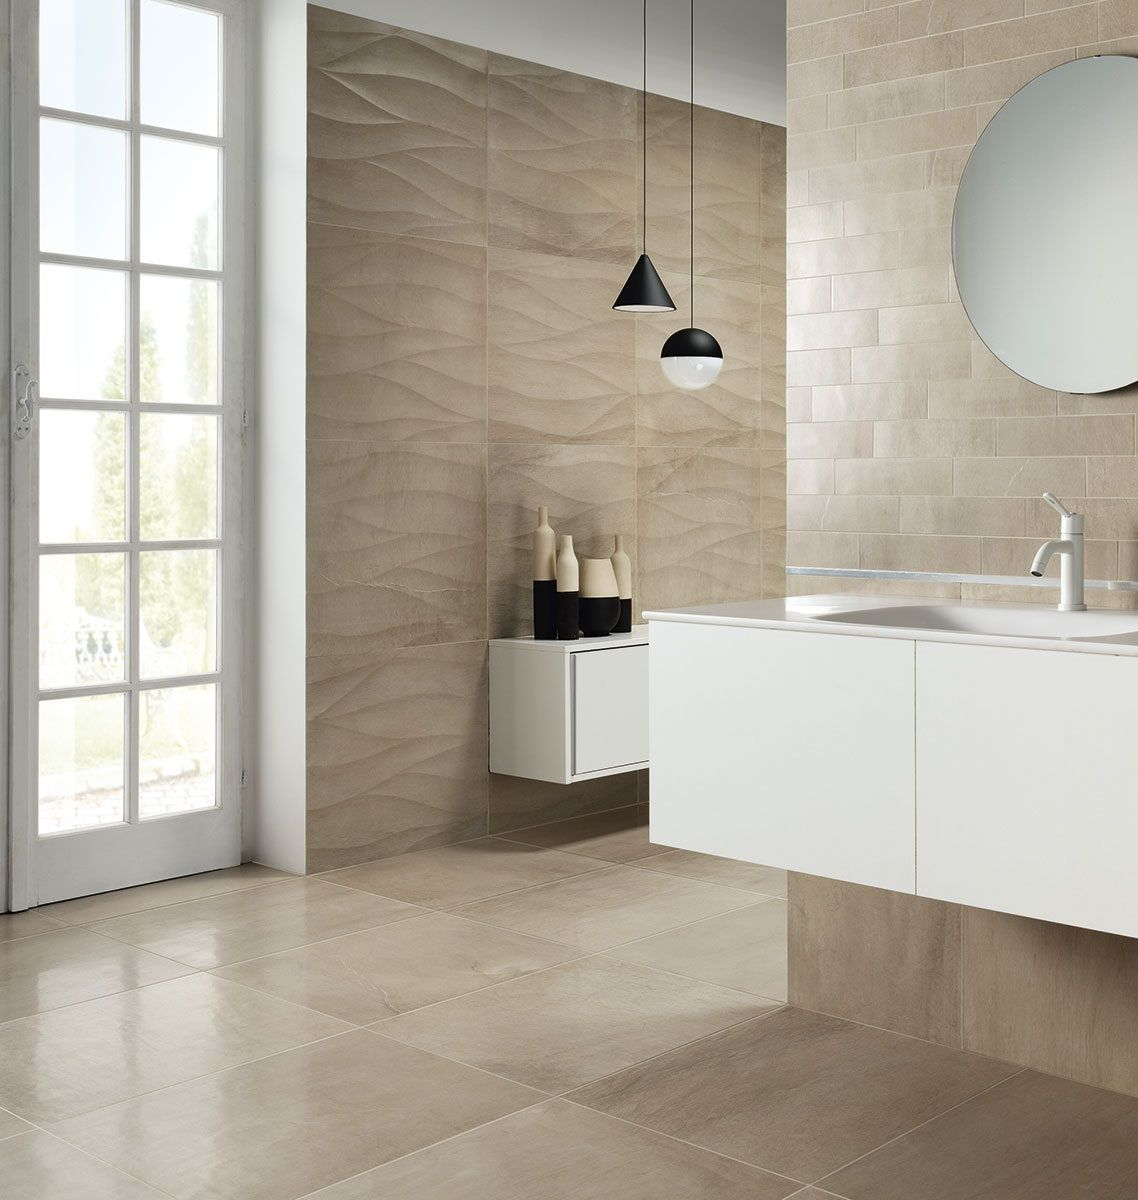 Earth Textured Tiles Bathroom Feature Wall Textured Tiles Bathroom Tiles Texture